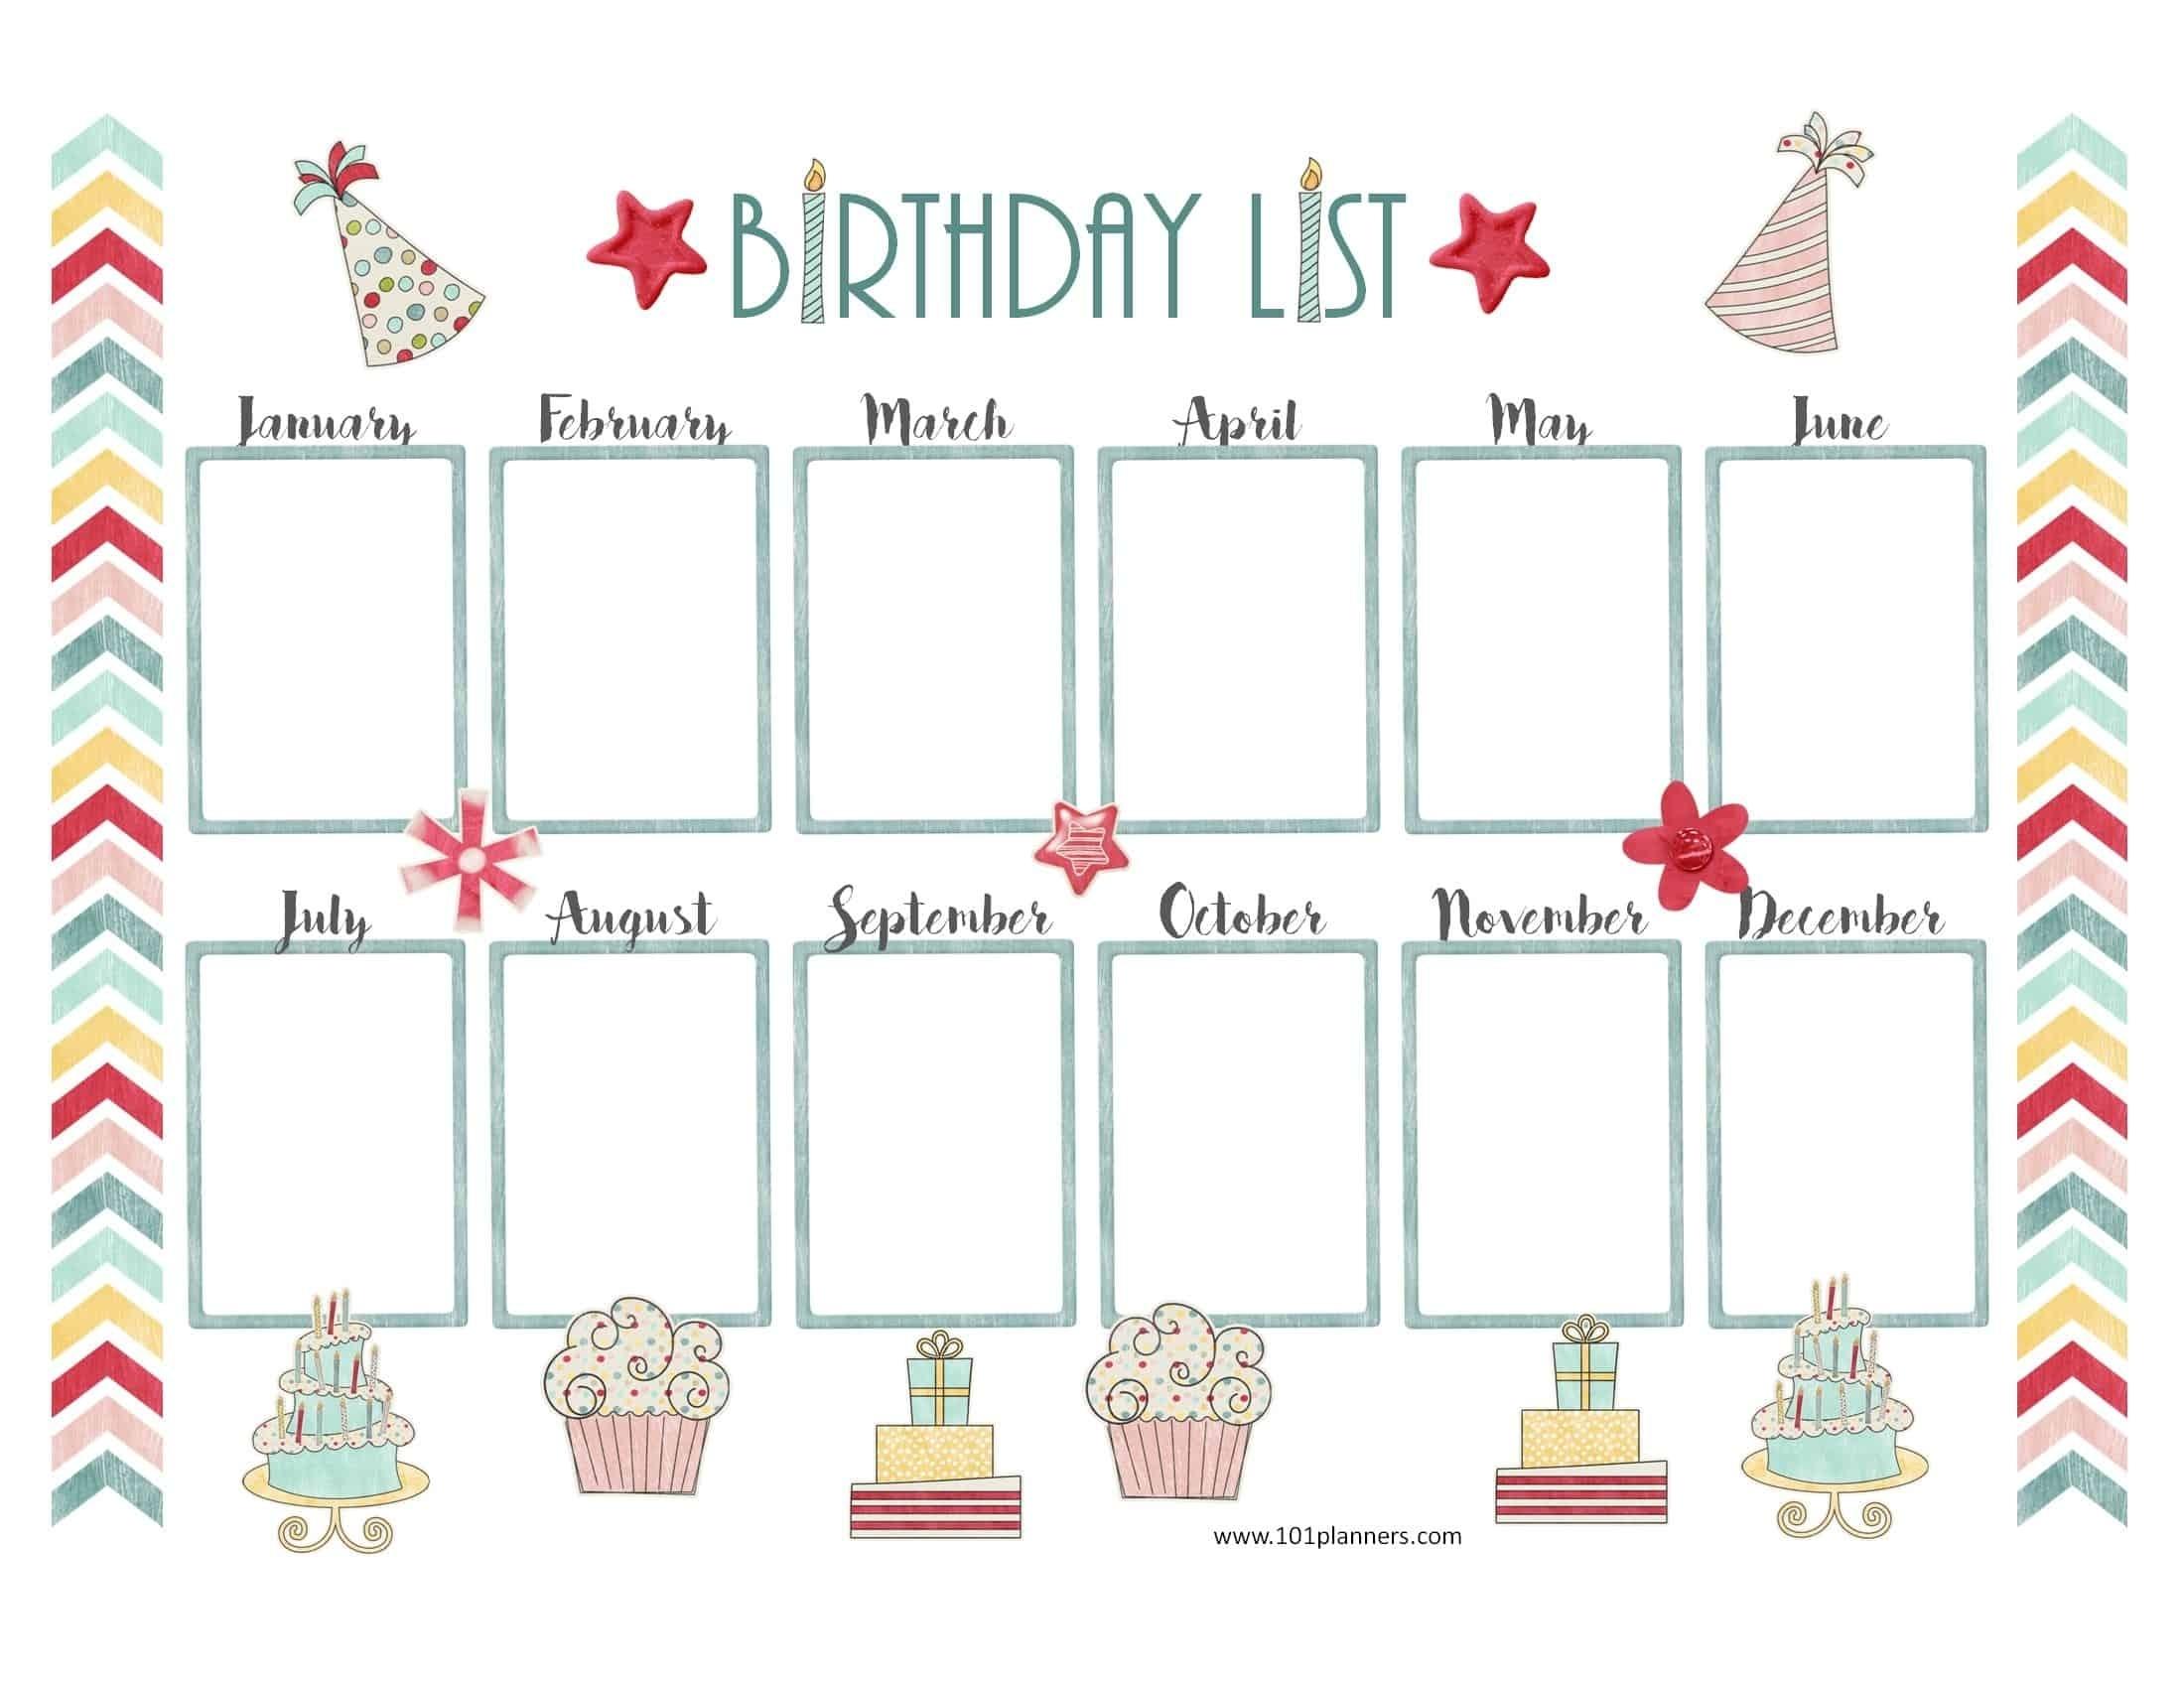 Free Birthday Calendar | Customize Online & Print At Home Print At Home Calendar Templates